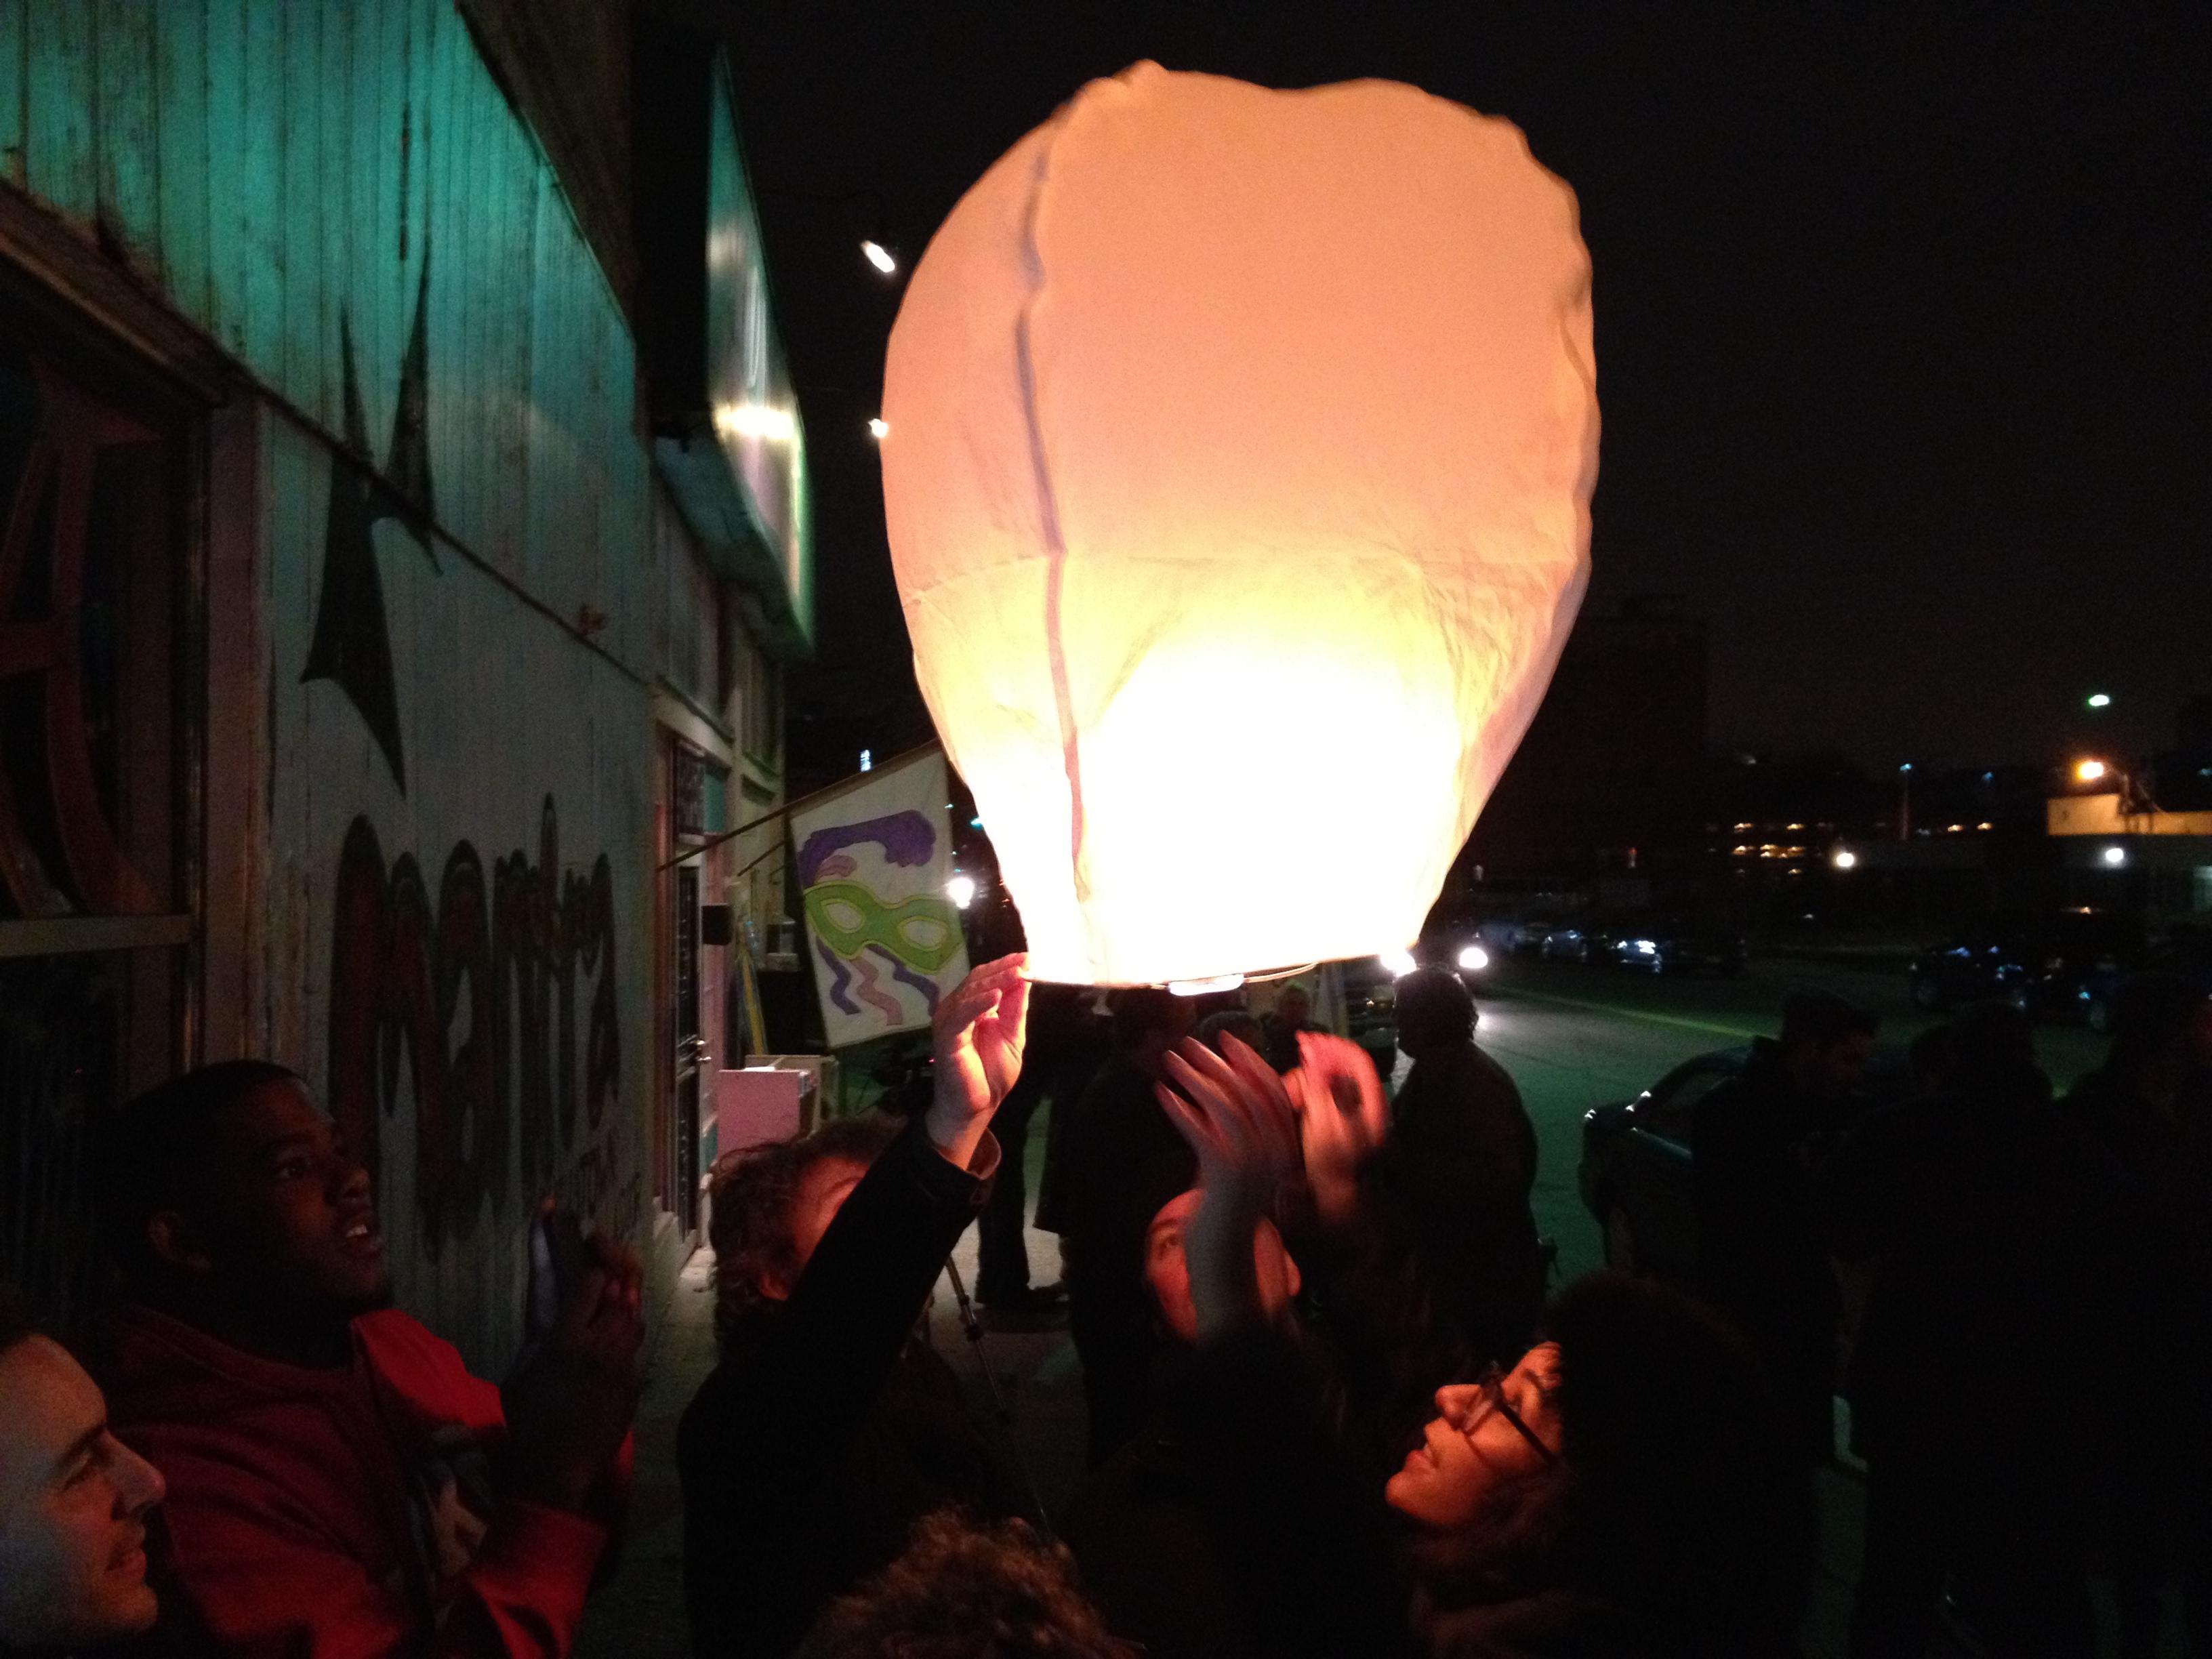 2012-12-03-IlluminatingChinatownImage.jpg